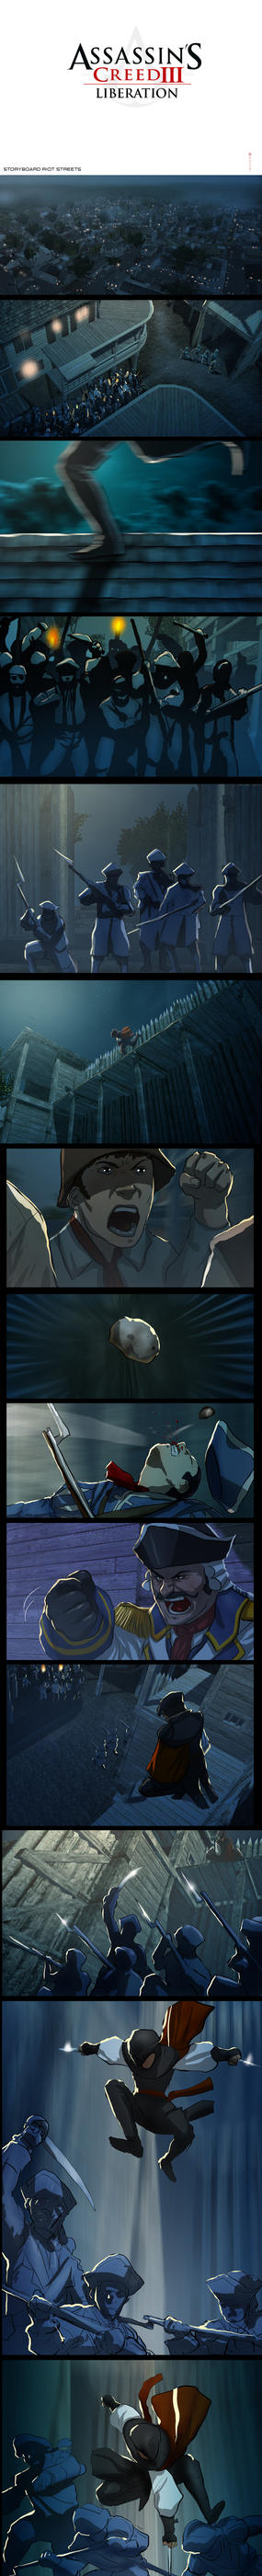 ACIII Liberation Storyboard Riots by satanasov